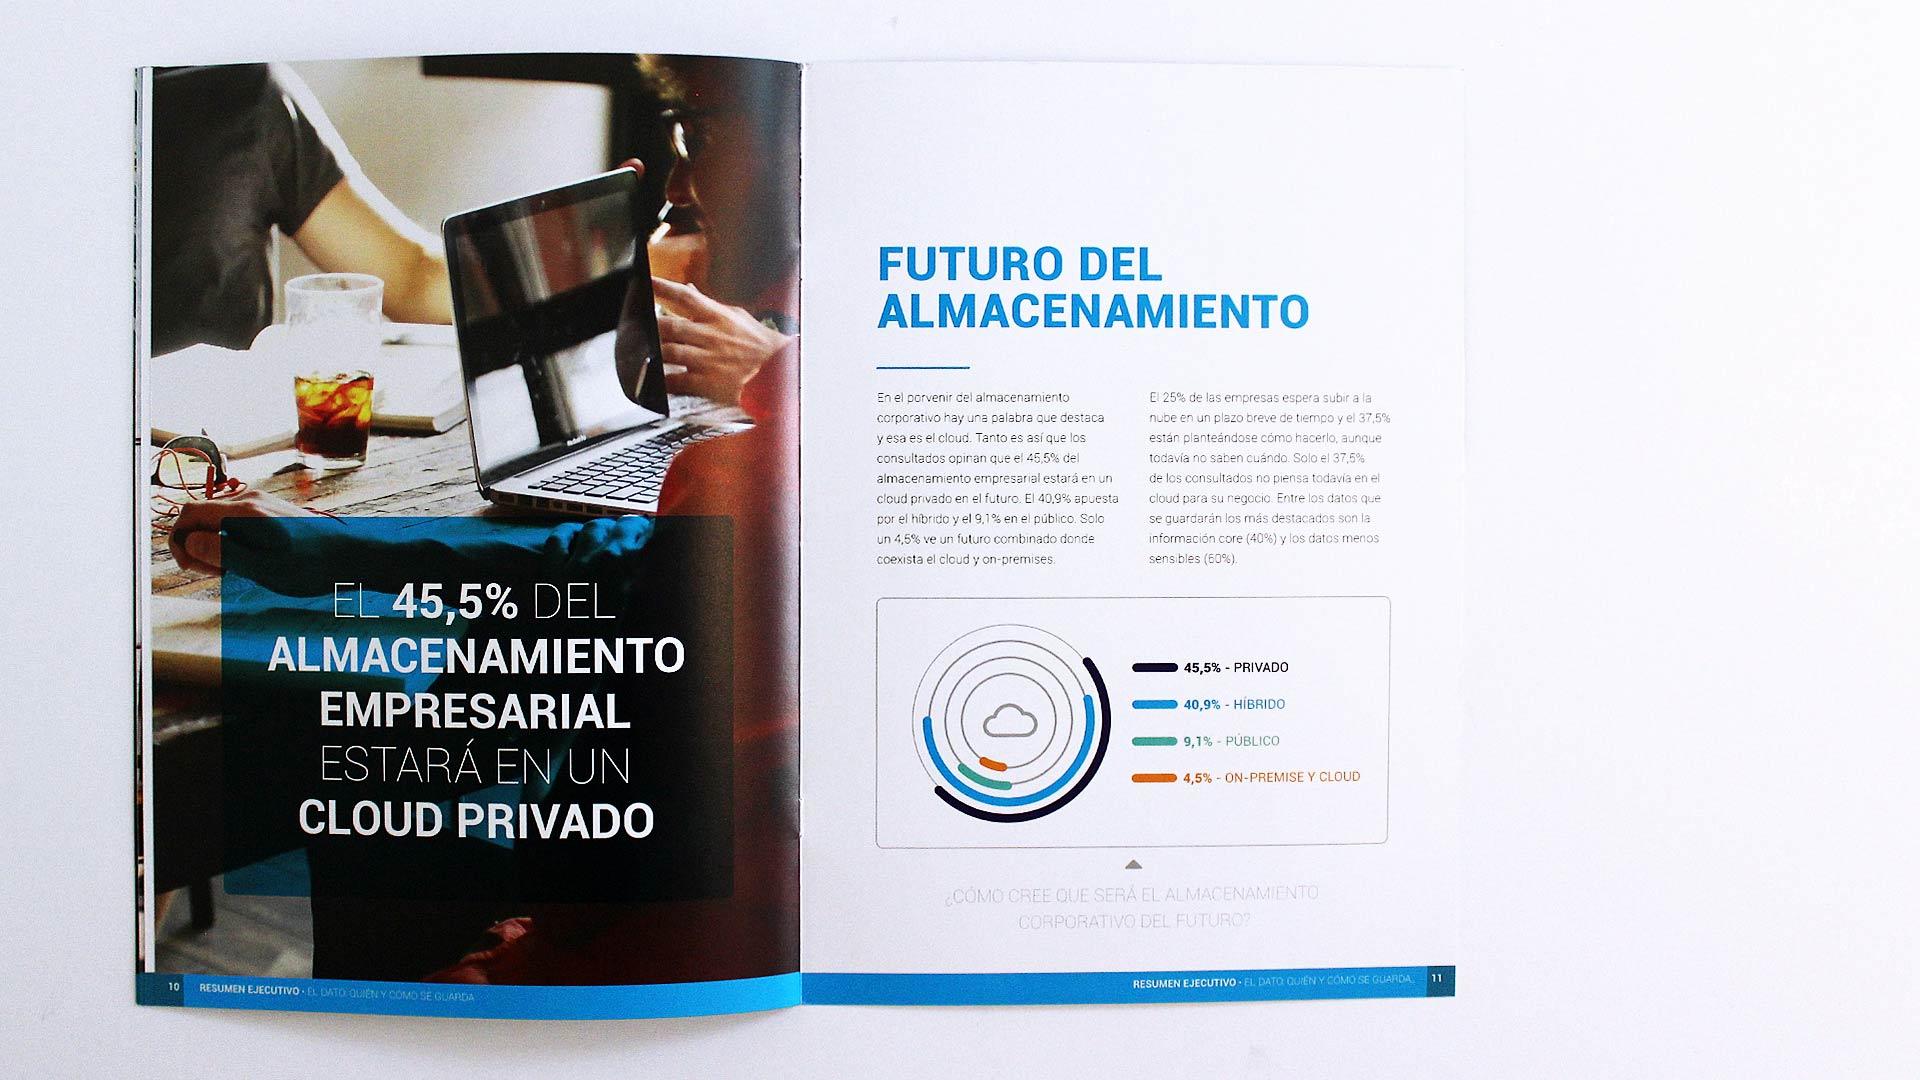 netapp-mediacloud-content-marketing-informe-resumen-ejecutivo-ebook-2017-07